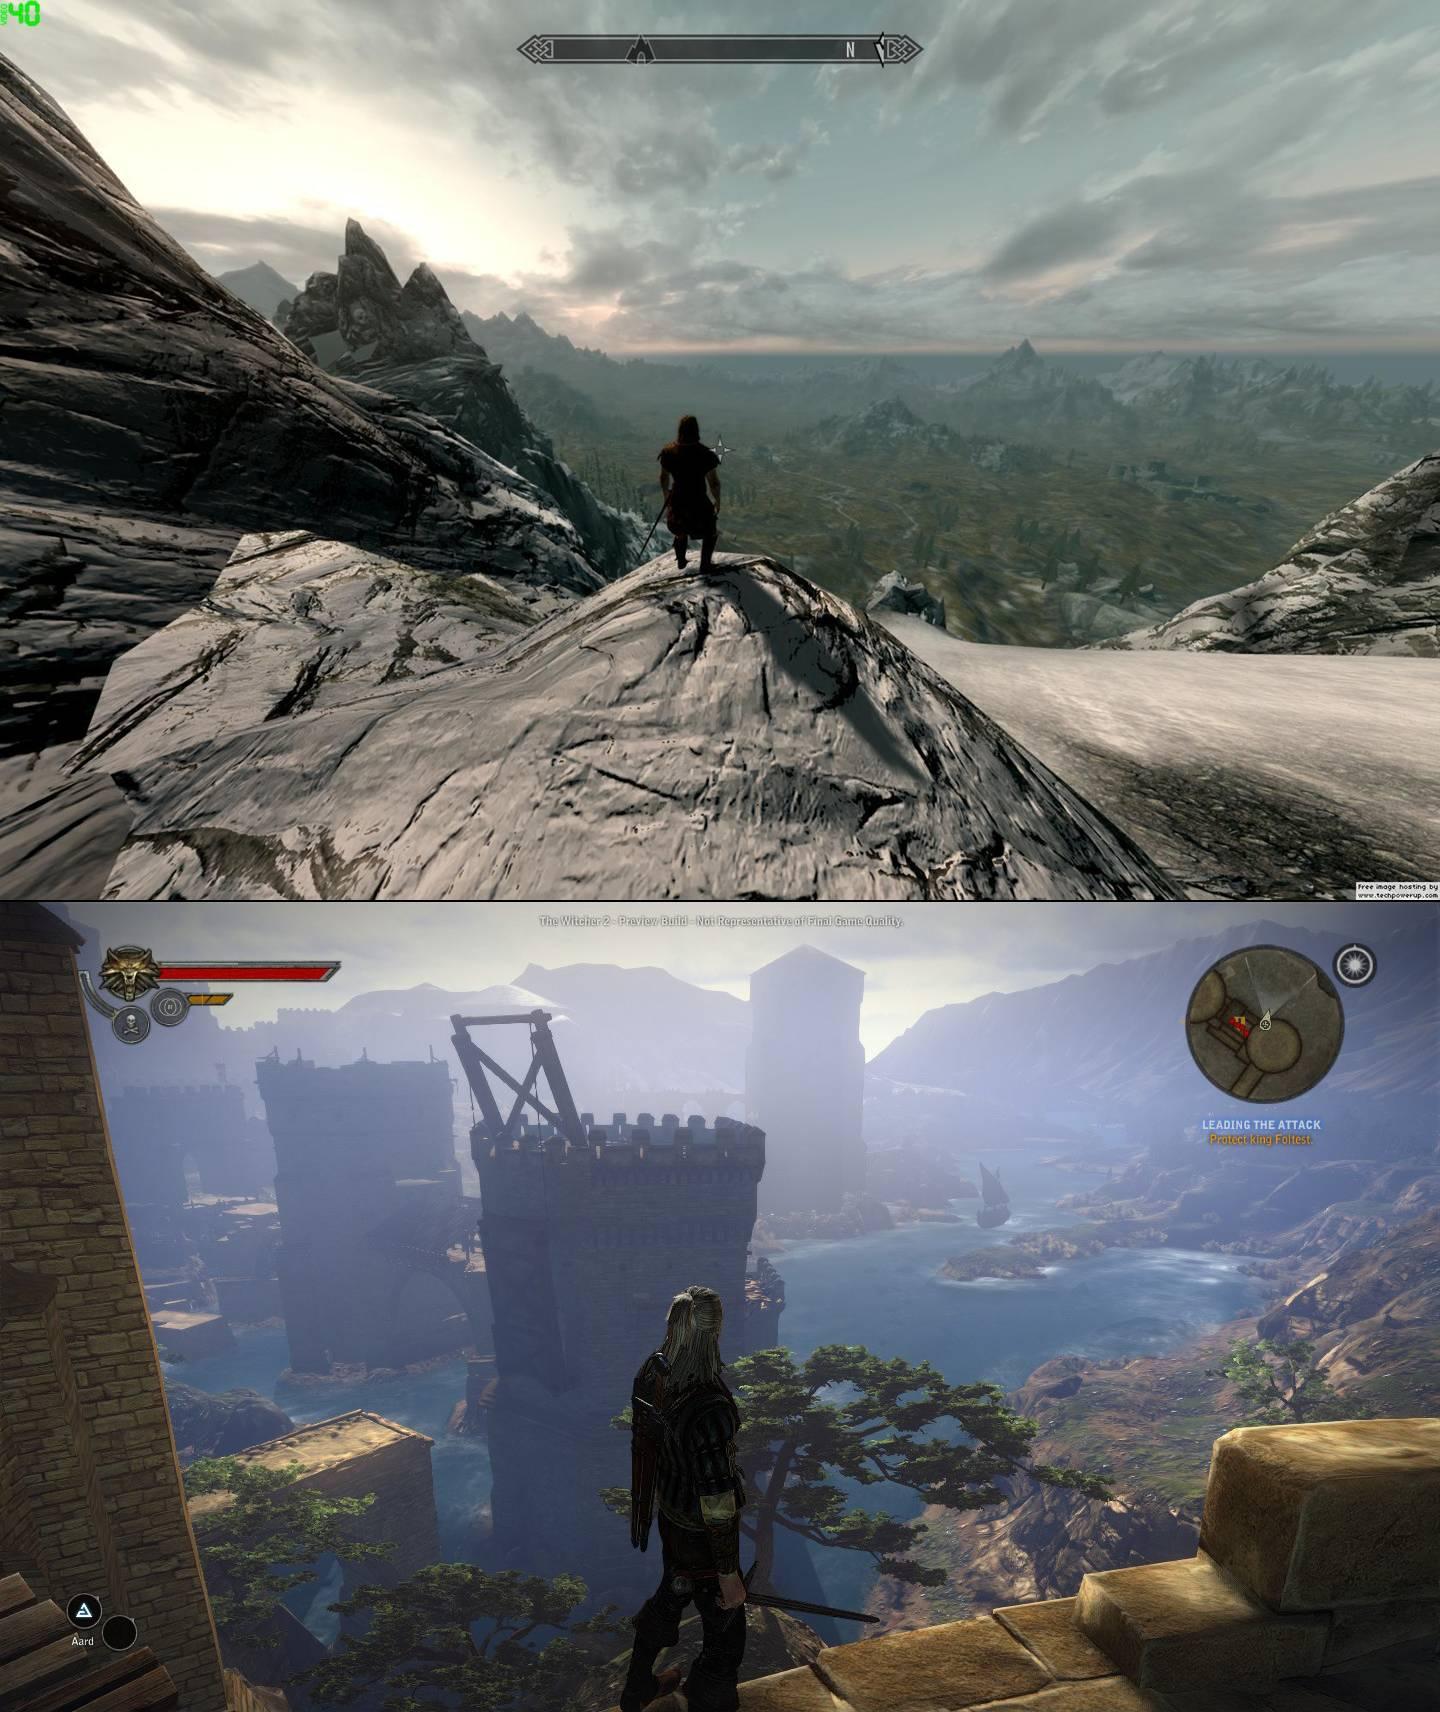 Skyrim Vs Witcher 2 Screenshot Comparison Battle Of The